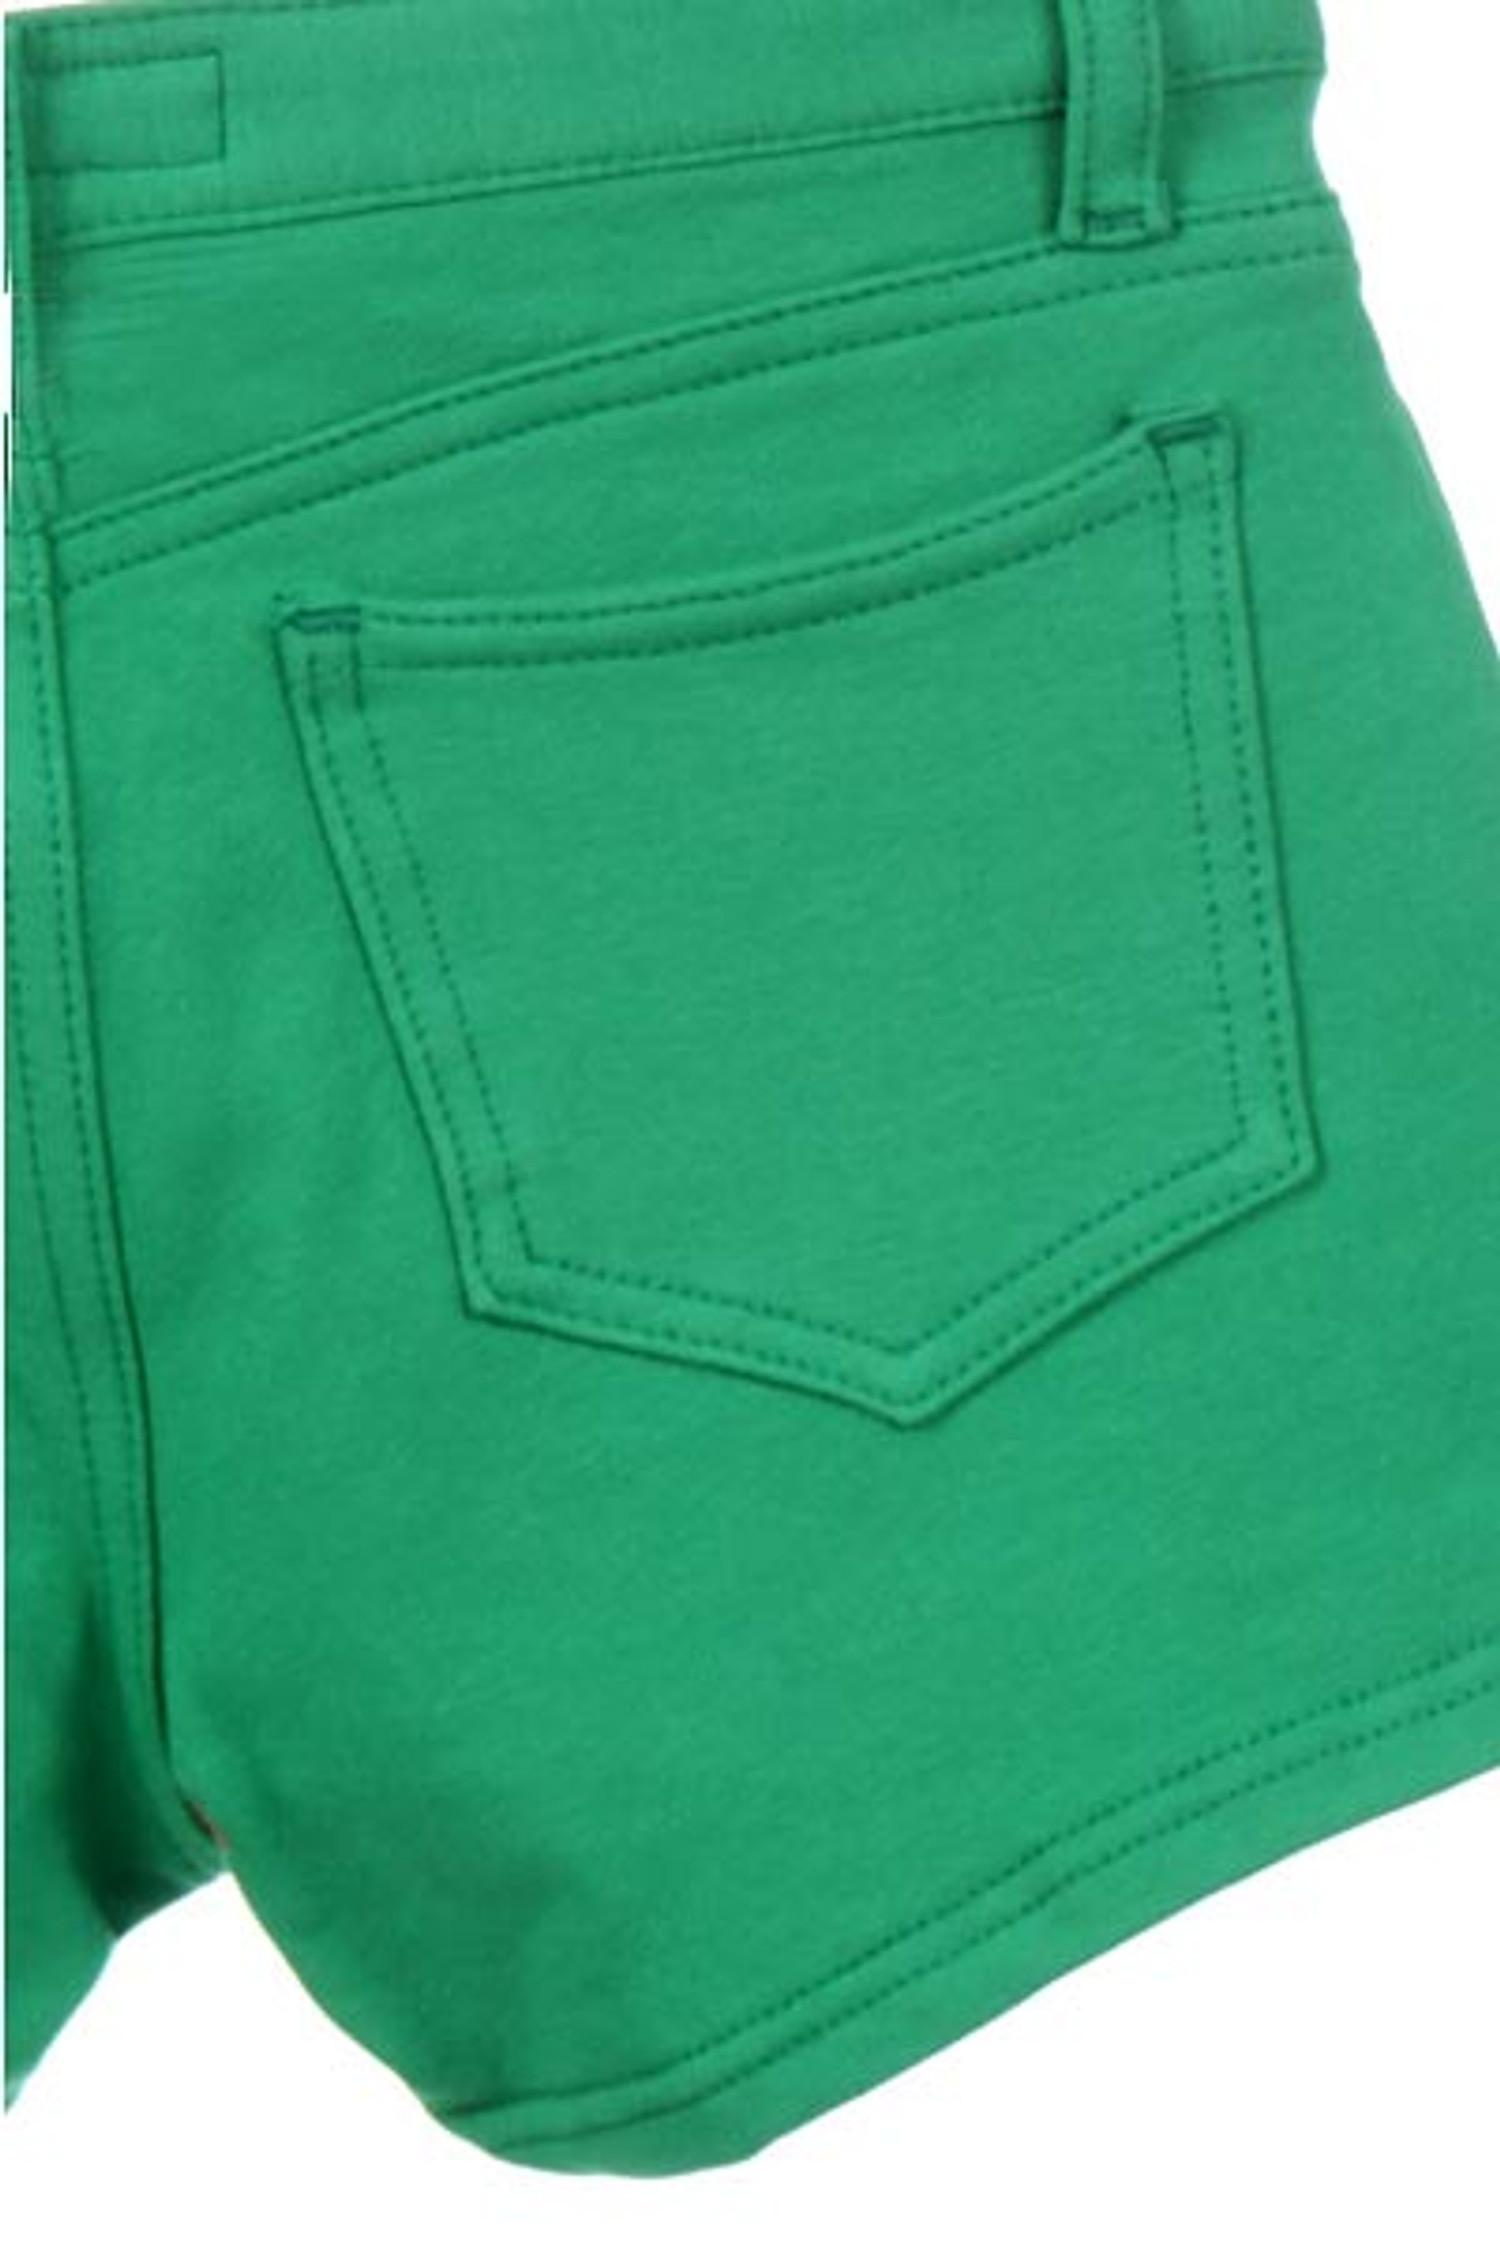 Green Signature Cotton Shorts